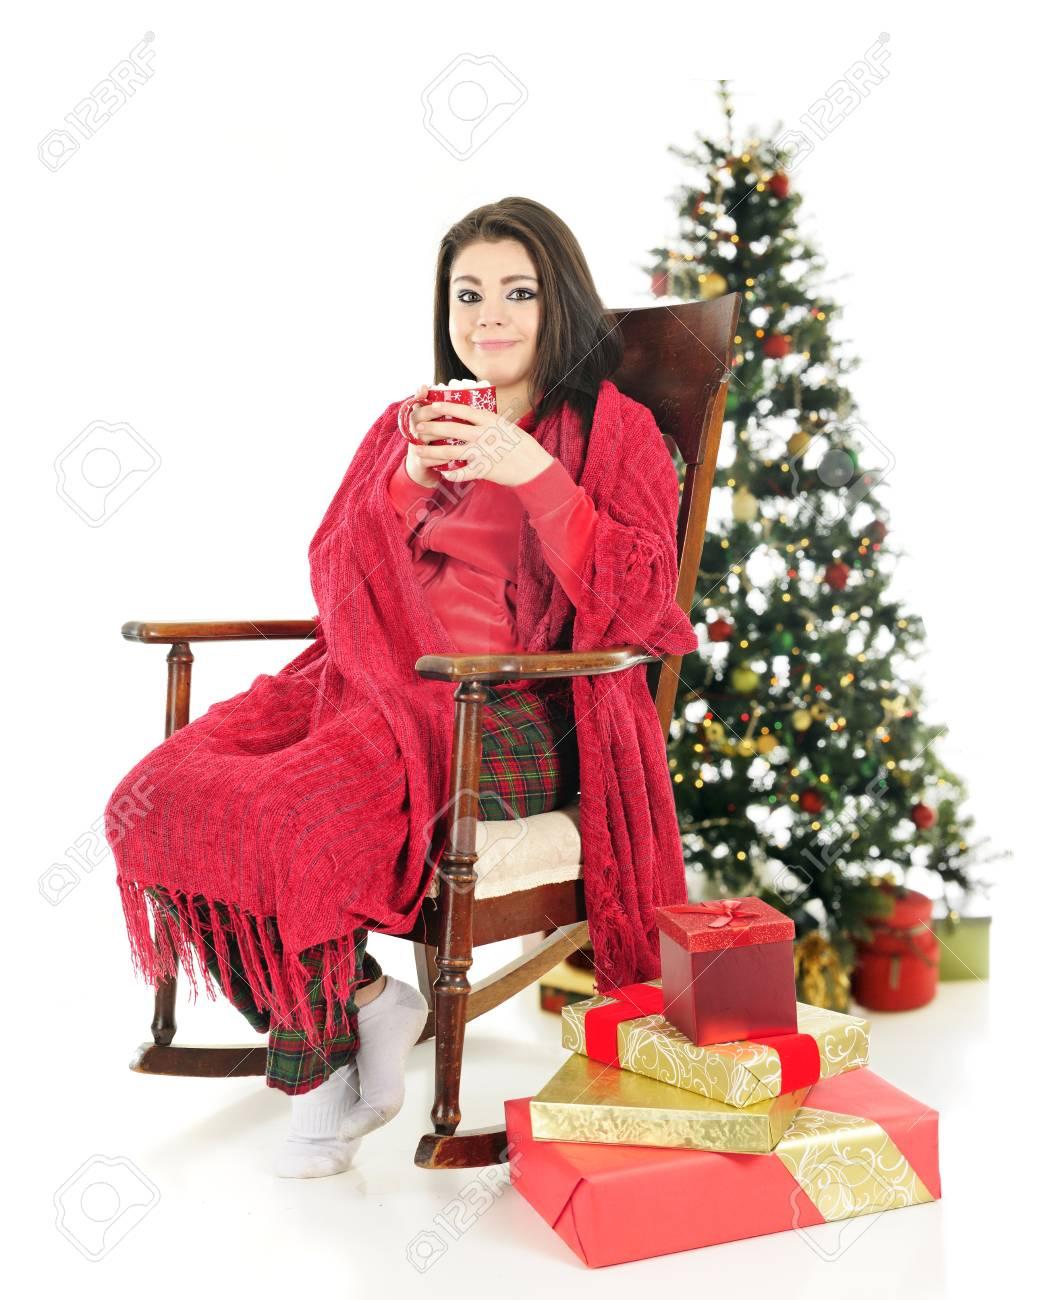 5892a3108 A Beautiful Teen Girl In Her Pajamas